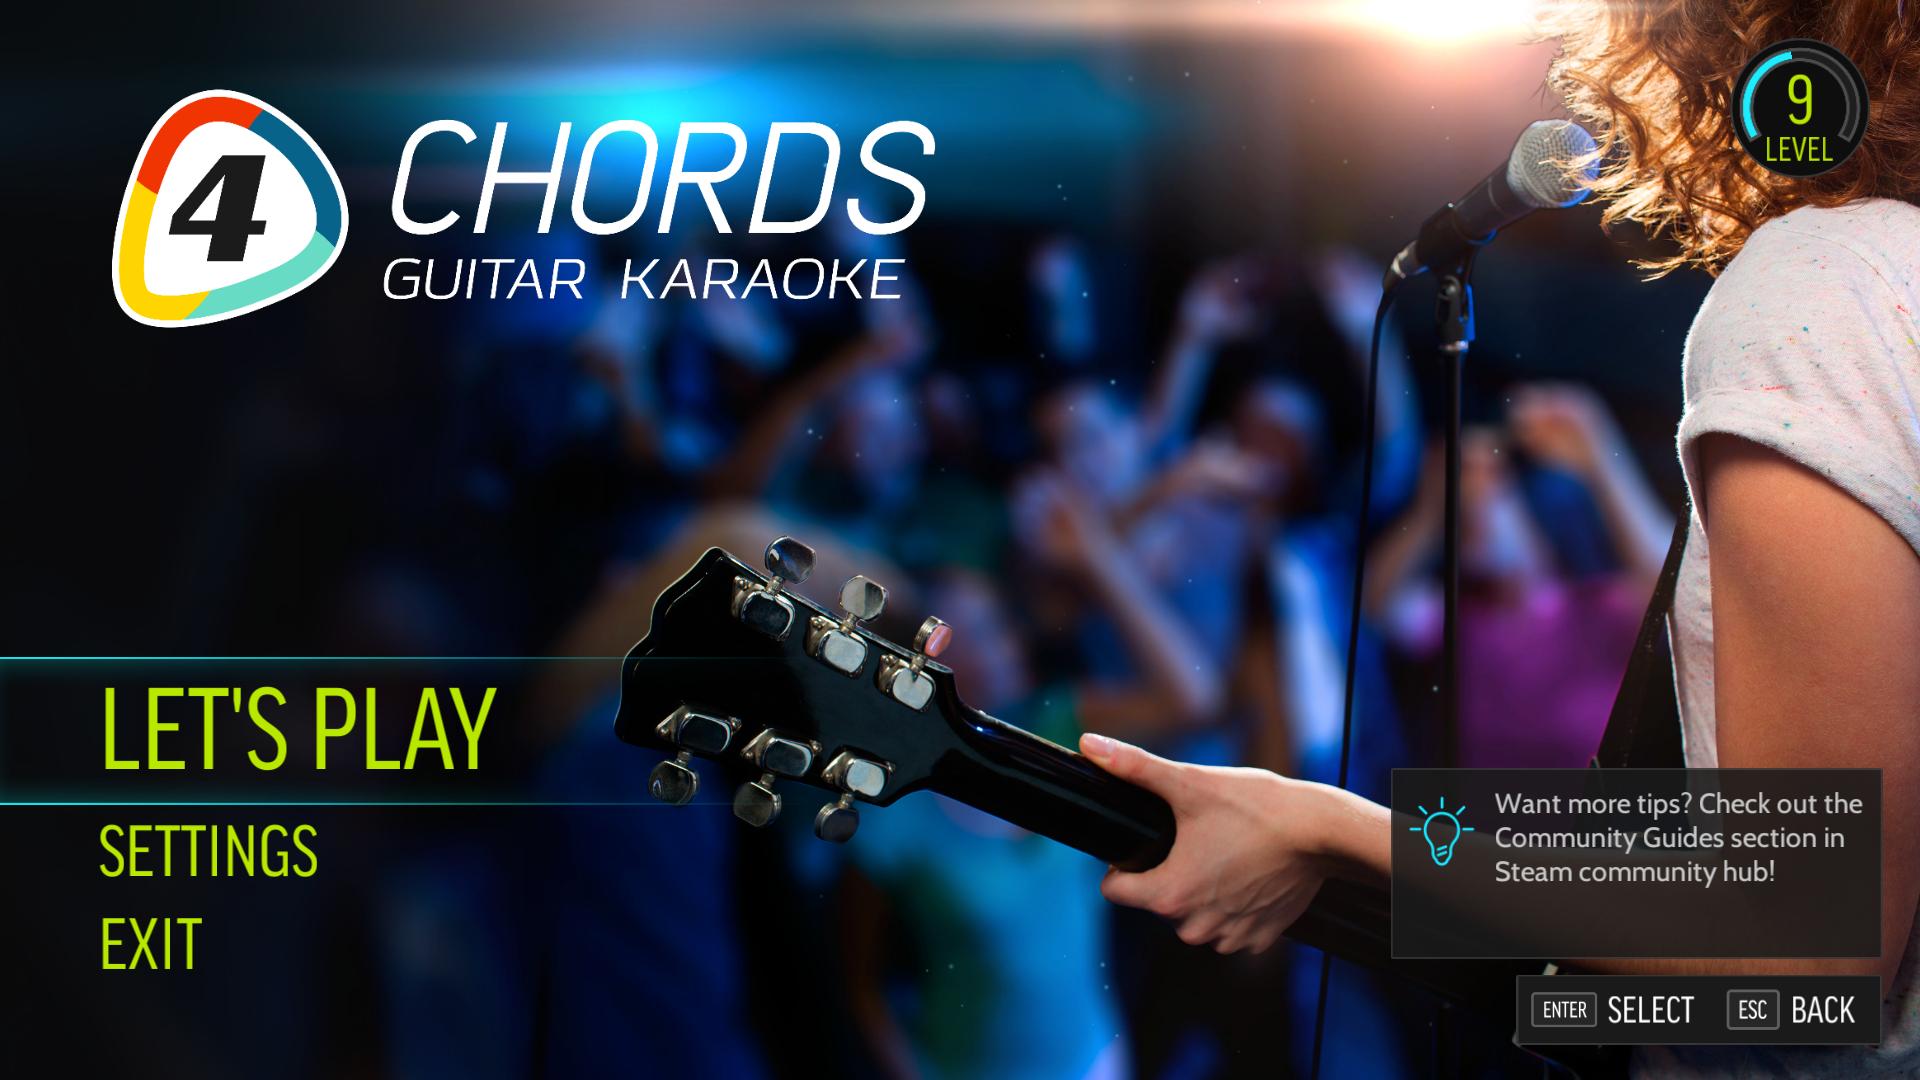 Fourchords Guitar Karaoke Katy Perry On Steam